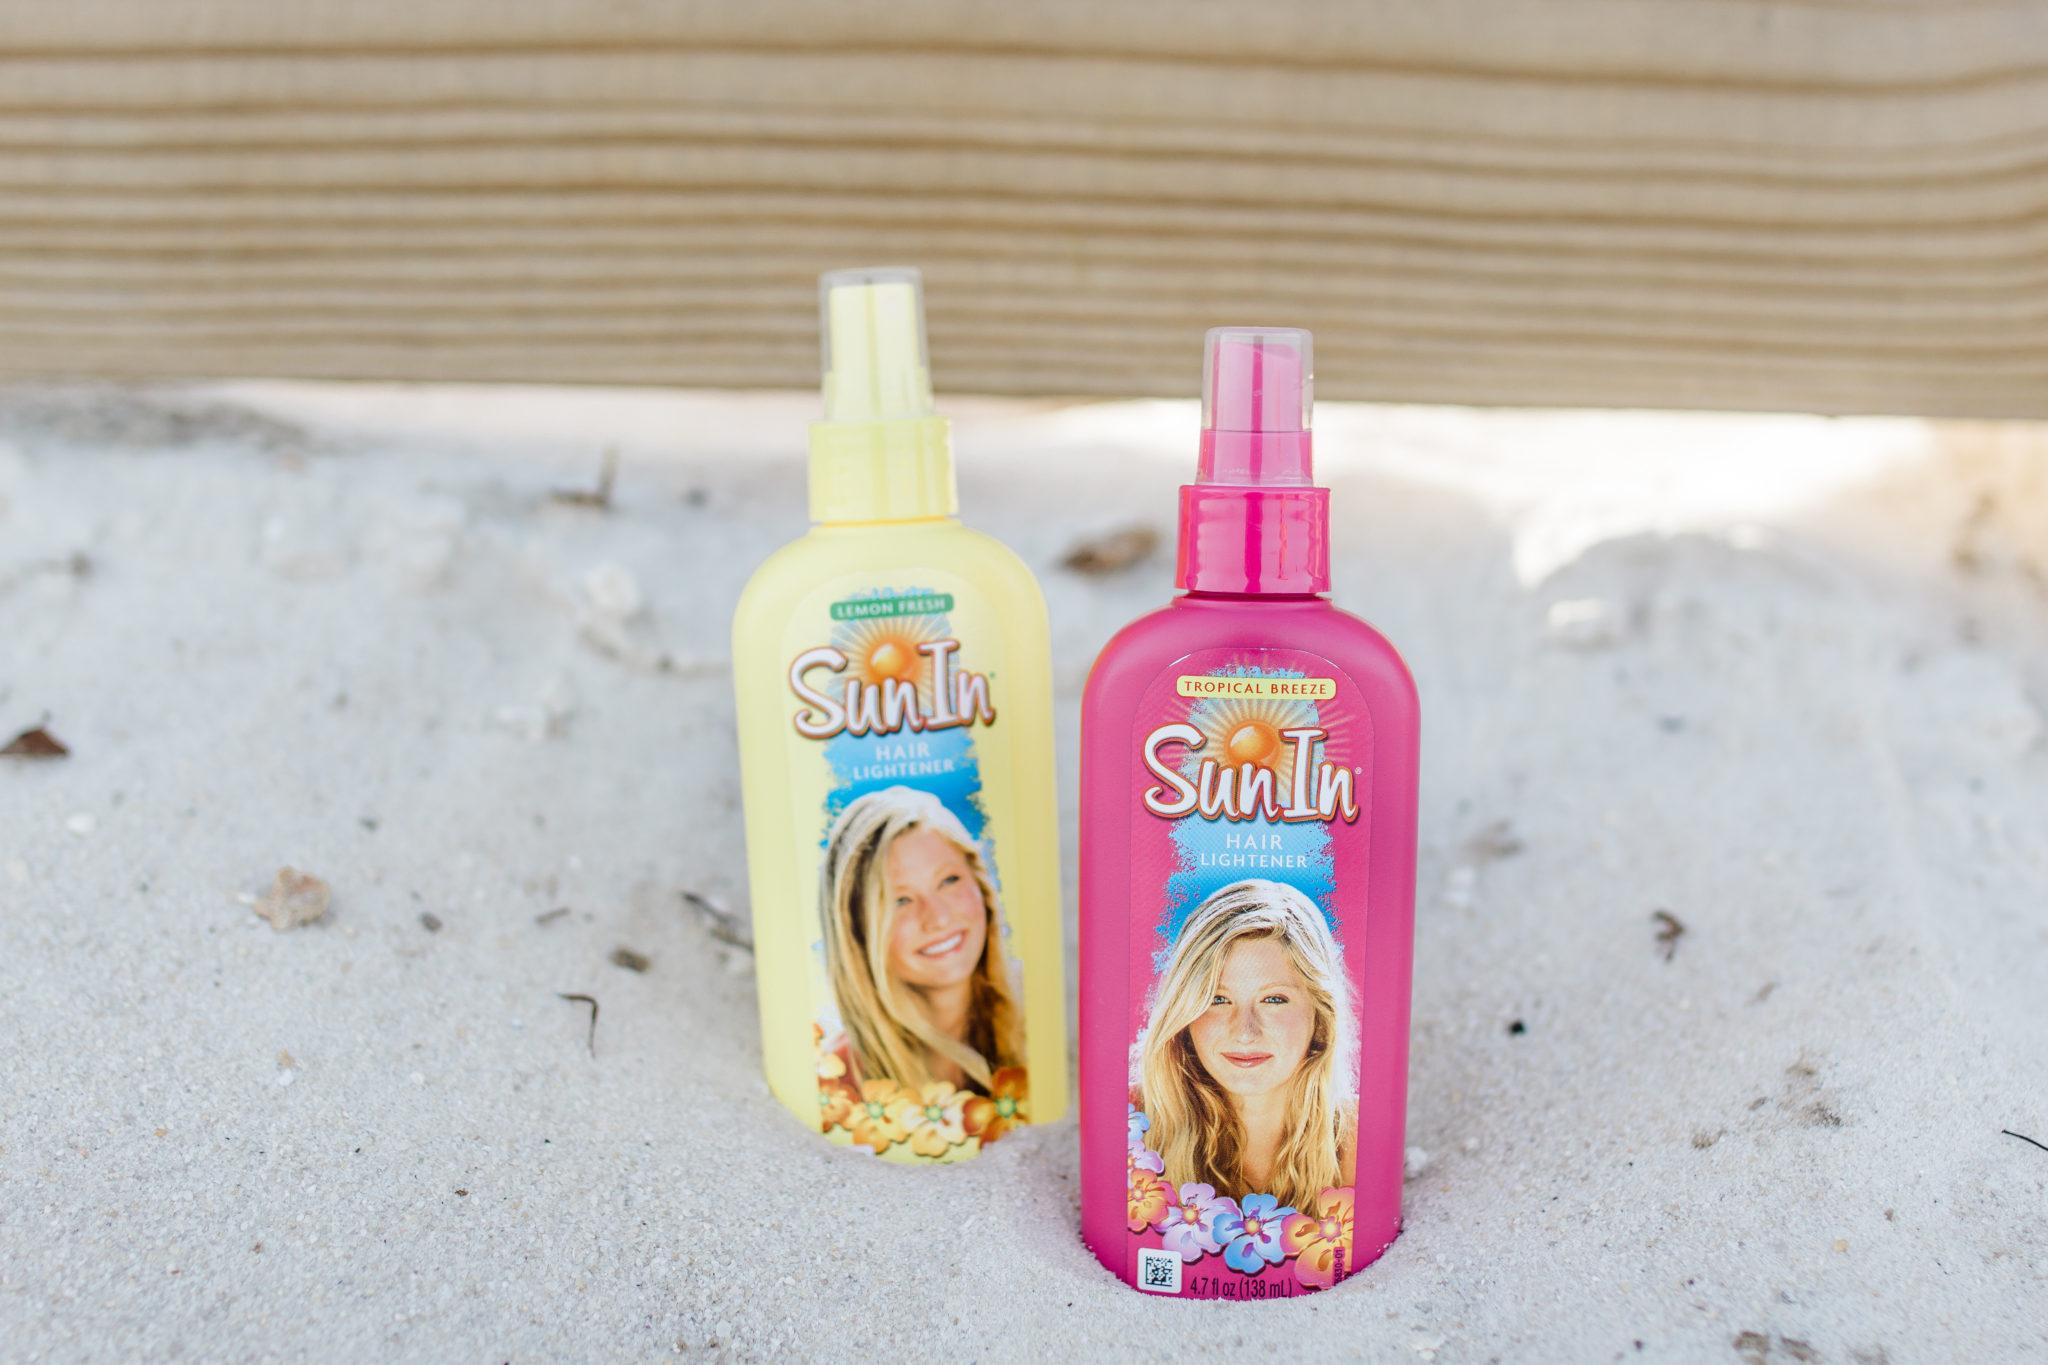 #SunInFunIn #ad #PowerPrimper #SunIn How to Get Summer Highlights at Home, Easy No Heat Summer Beach Waves